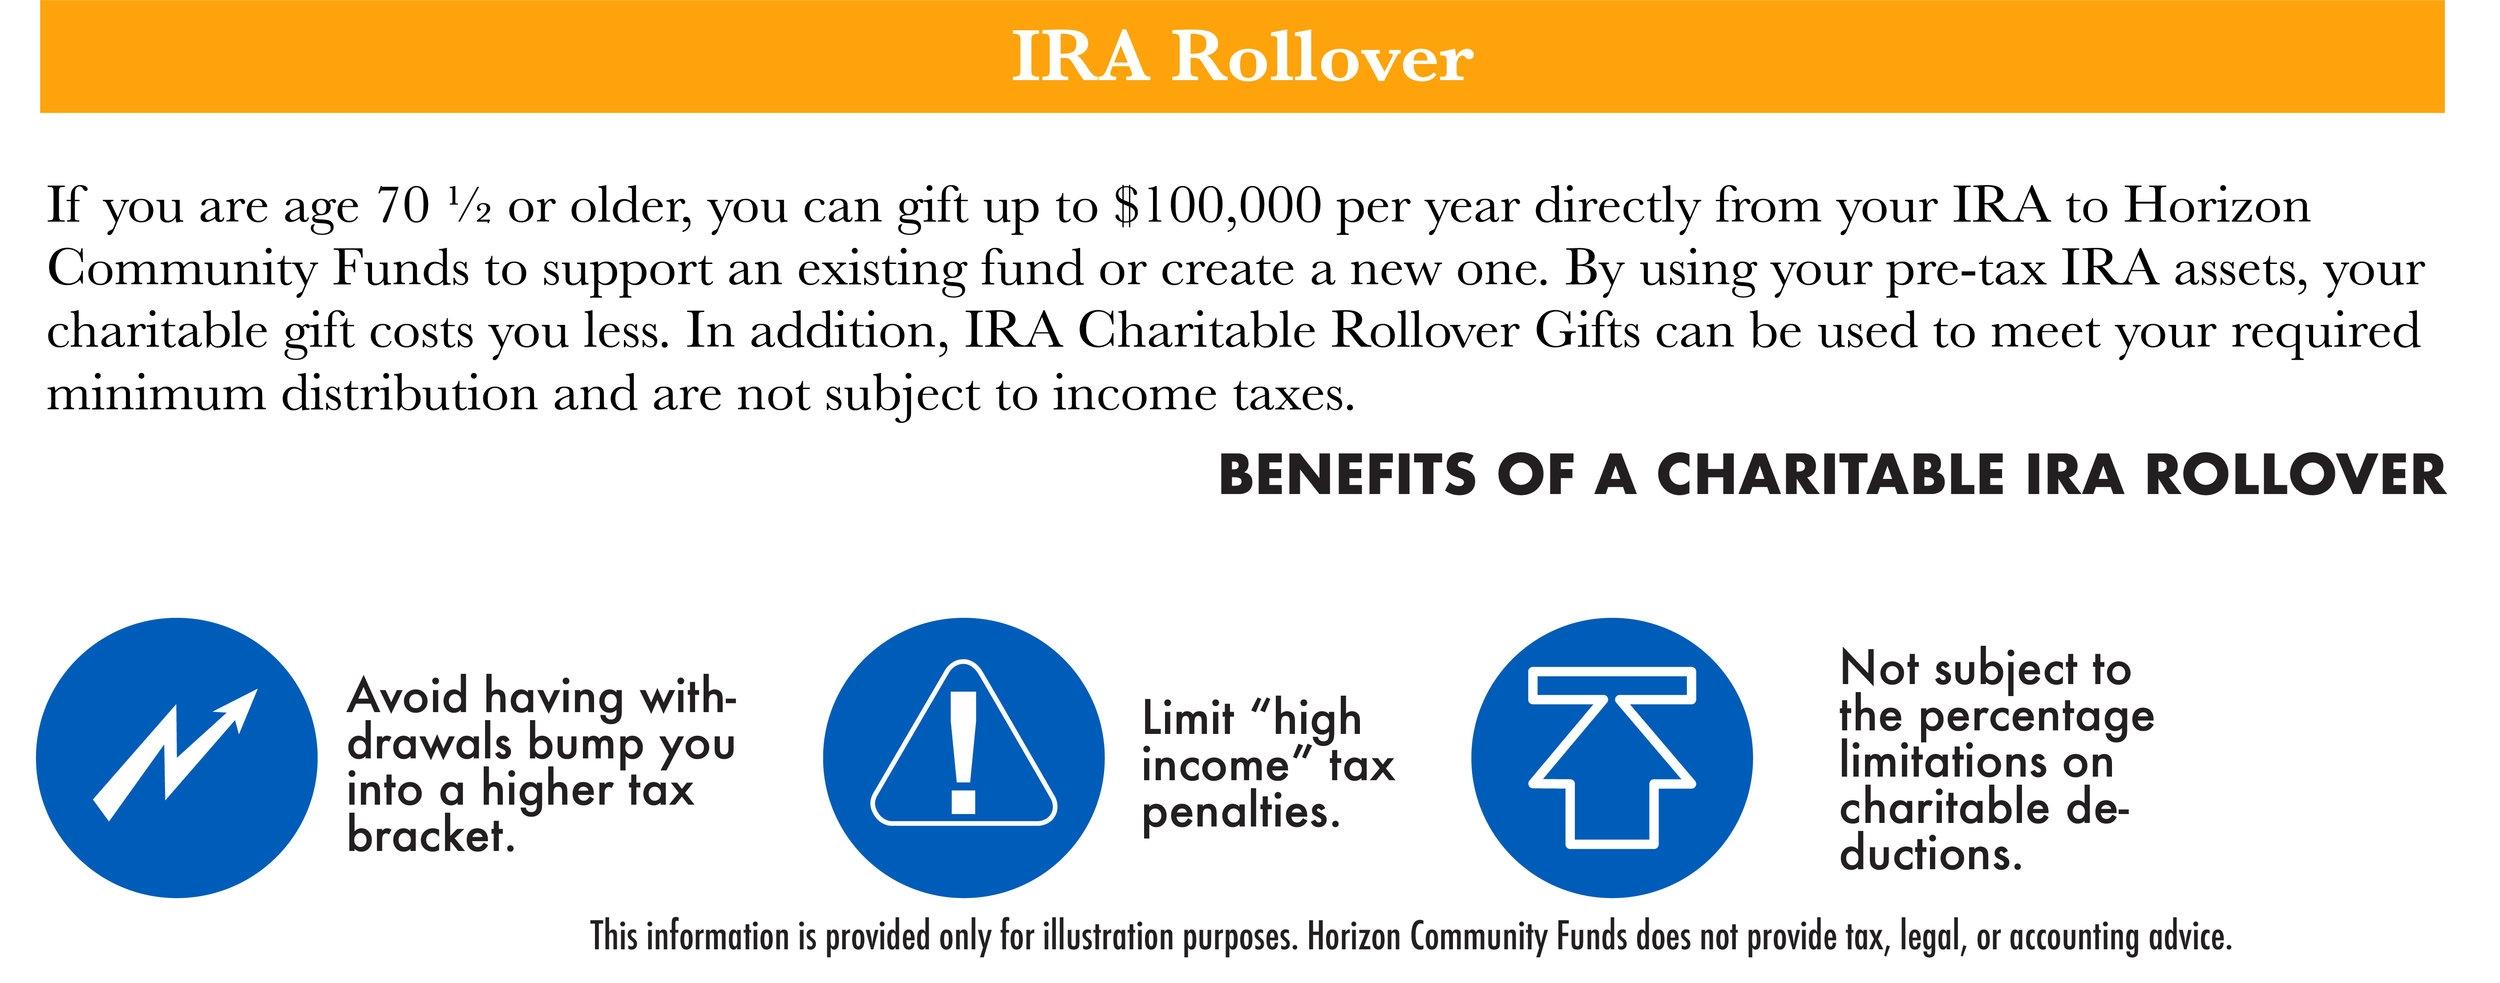 Benefits of IRA Rollover.jpg